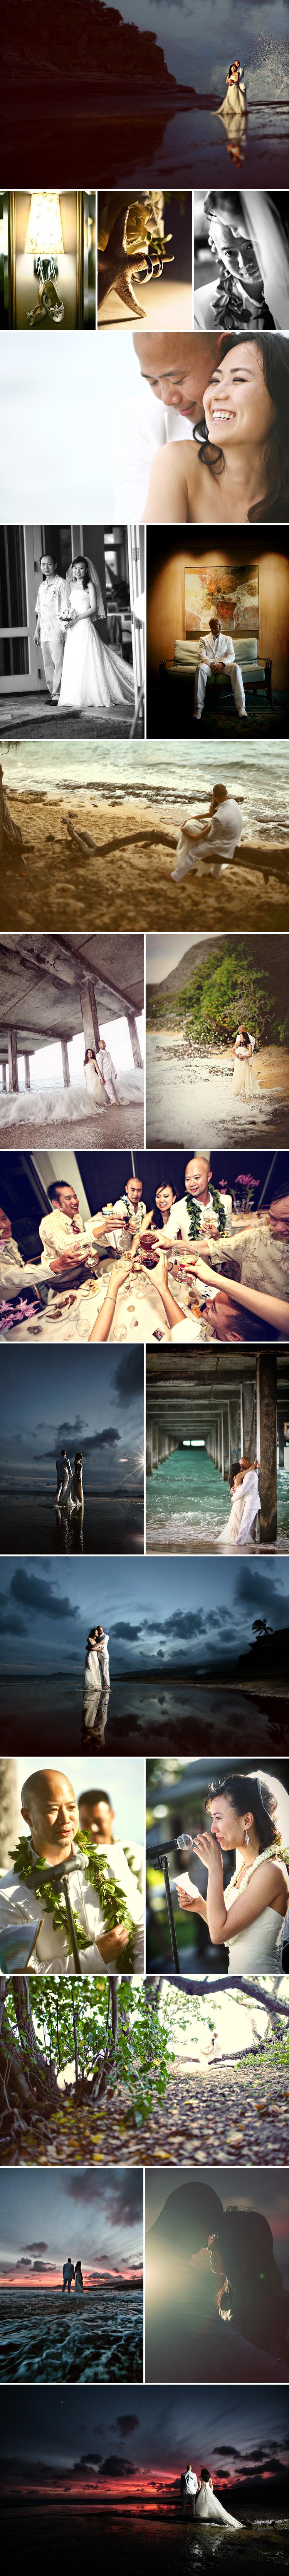 Frank Amodo Photography, Hawaii Wedding Photographer